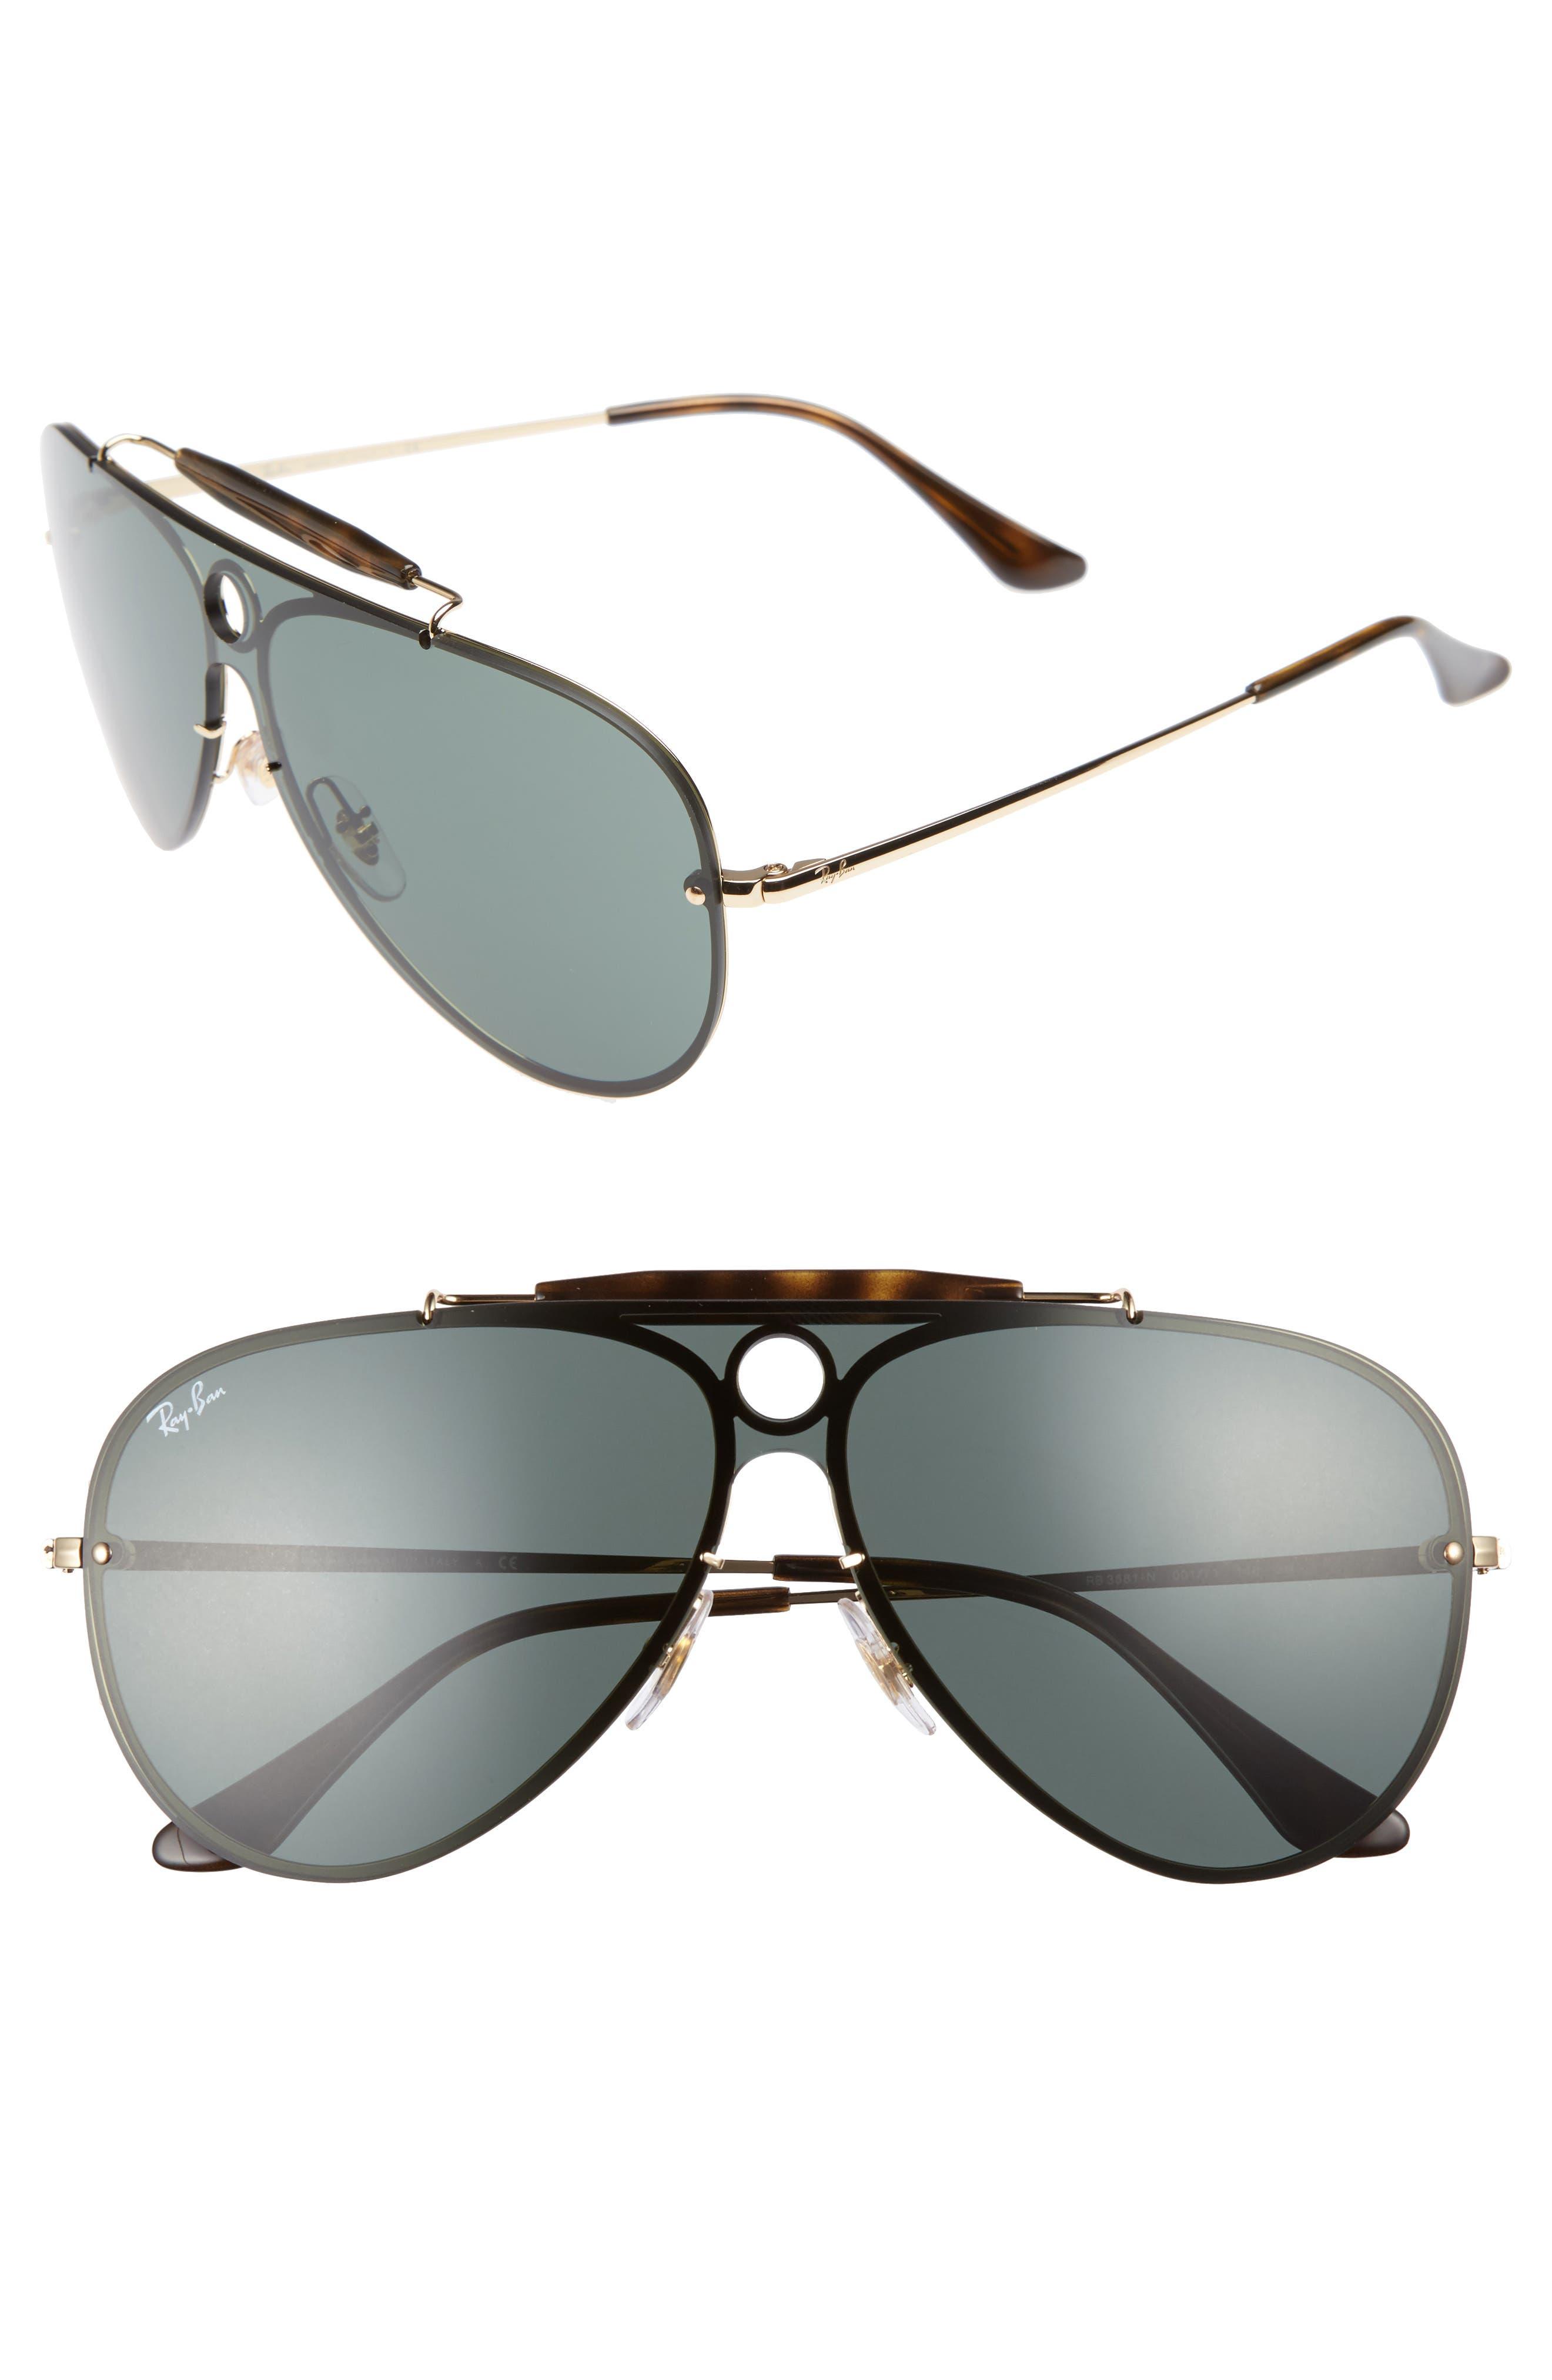 Ray-Ban Blaze Shooter Shield Sunglasses